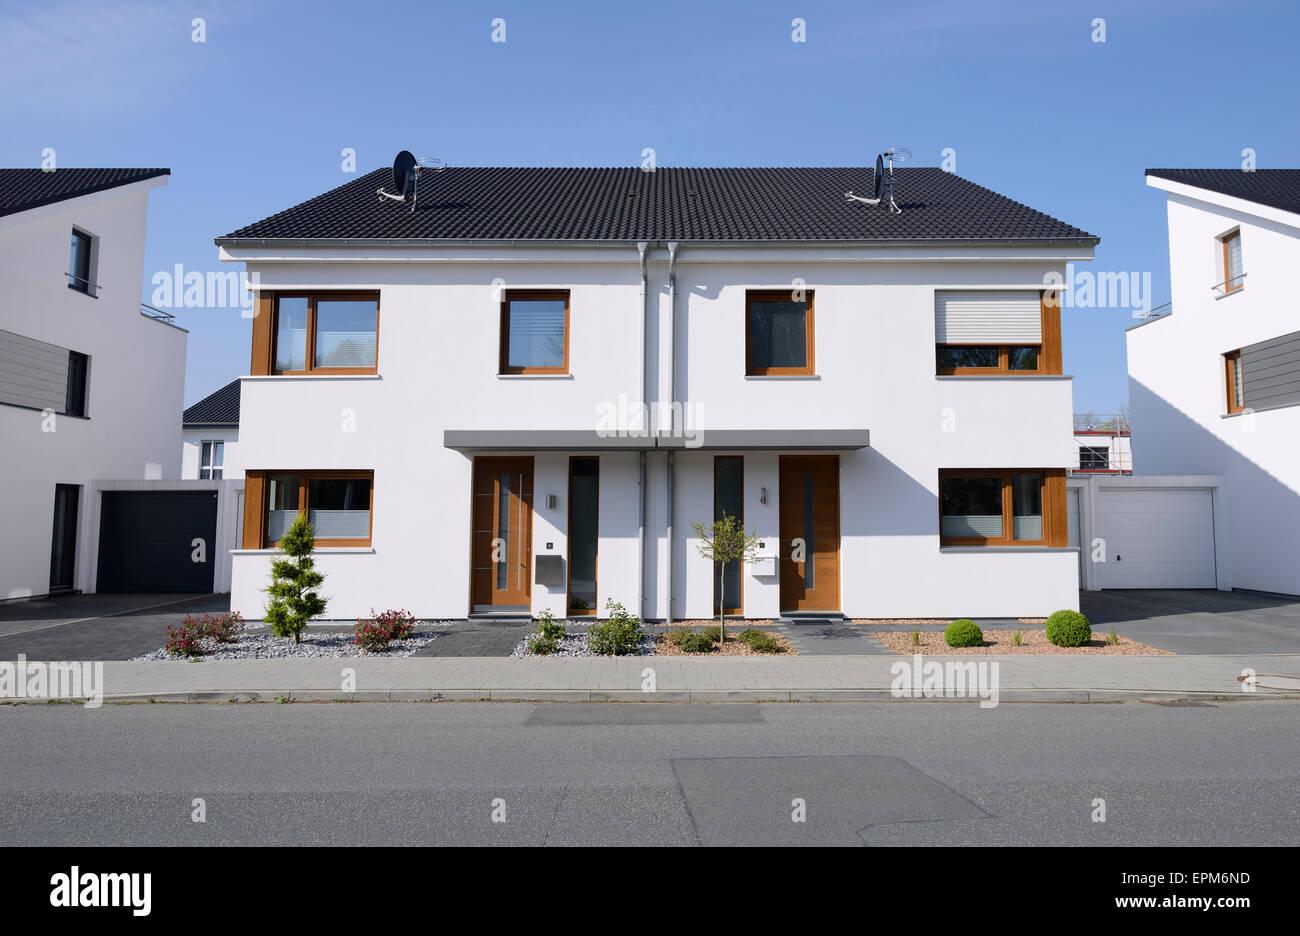 Germany, Moenchengladbach, semidetached house - Stock Image